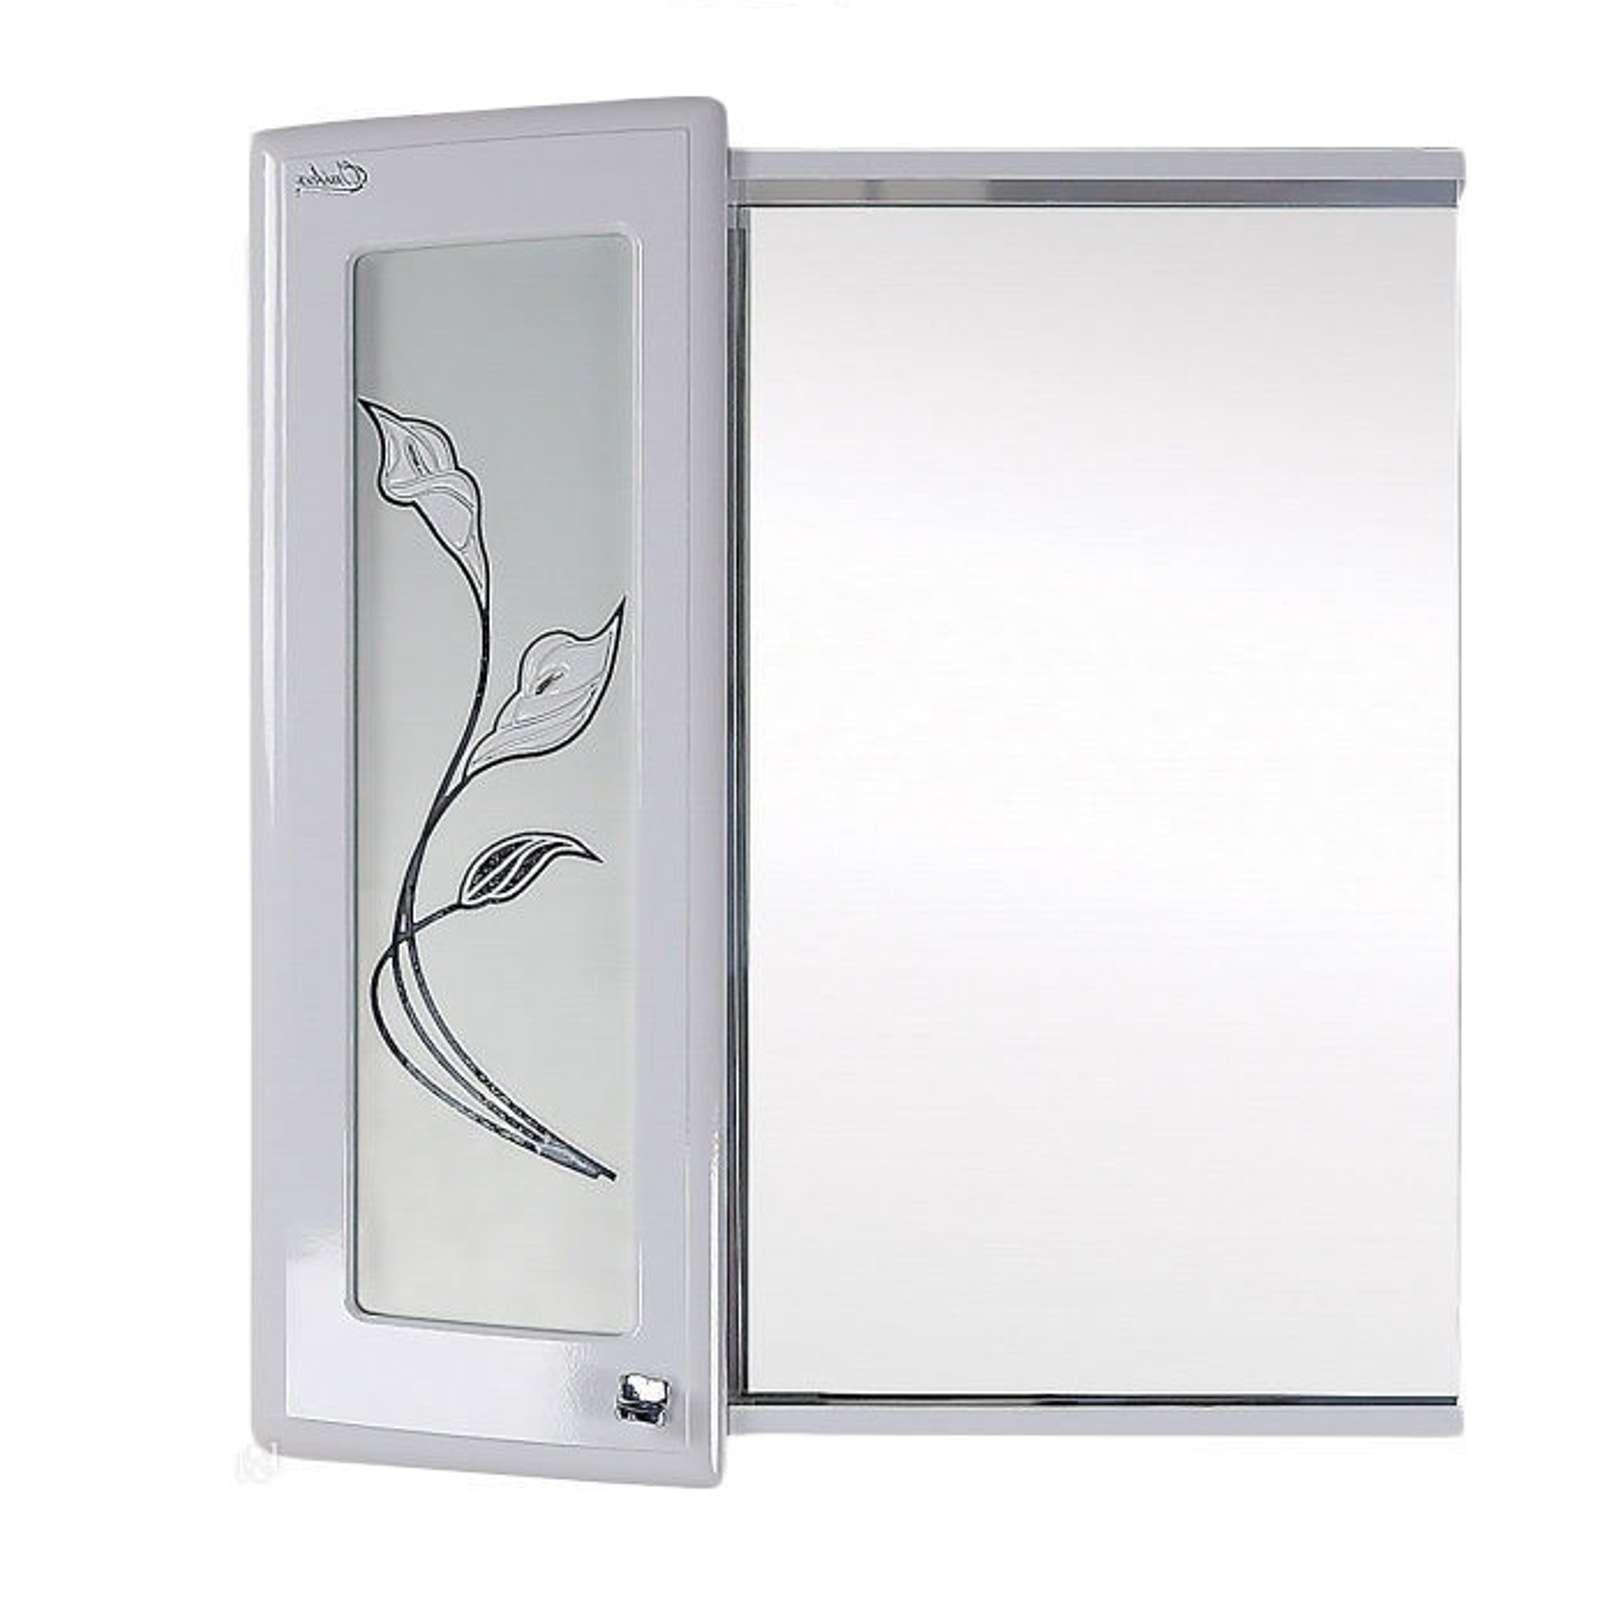 Зеркальный шкаф Onika Валенсия 65 левый (206533)